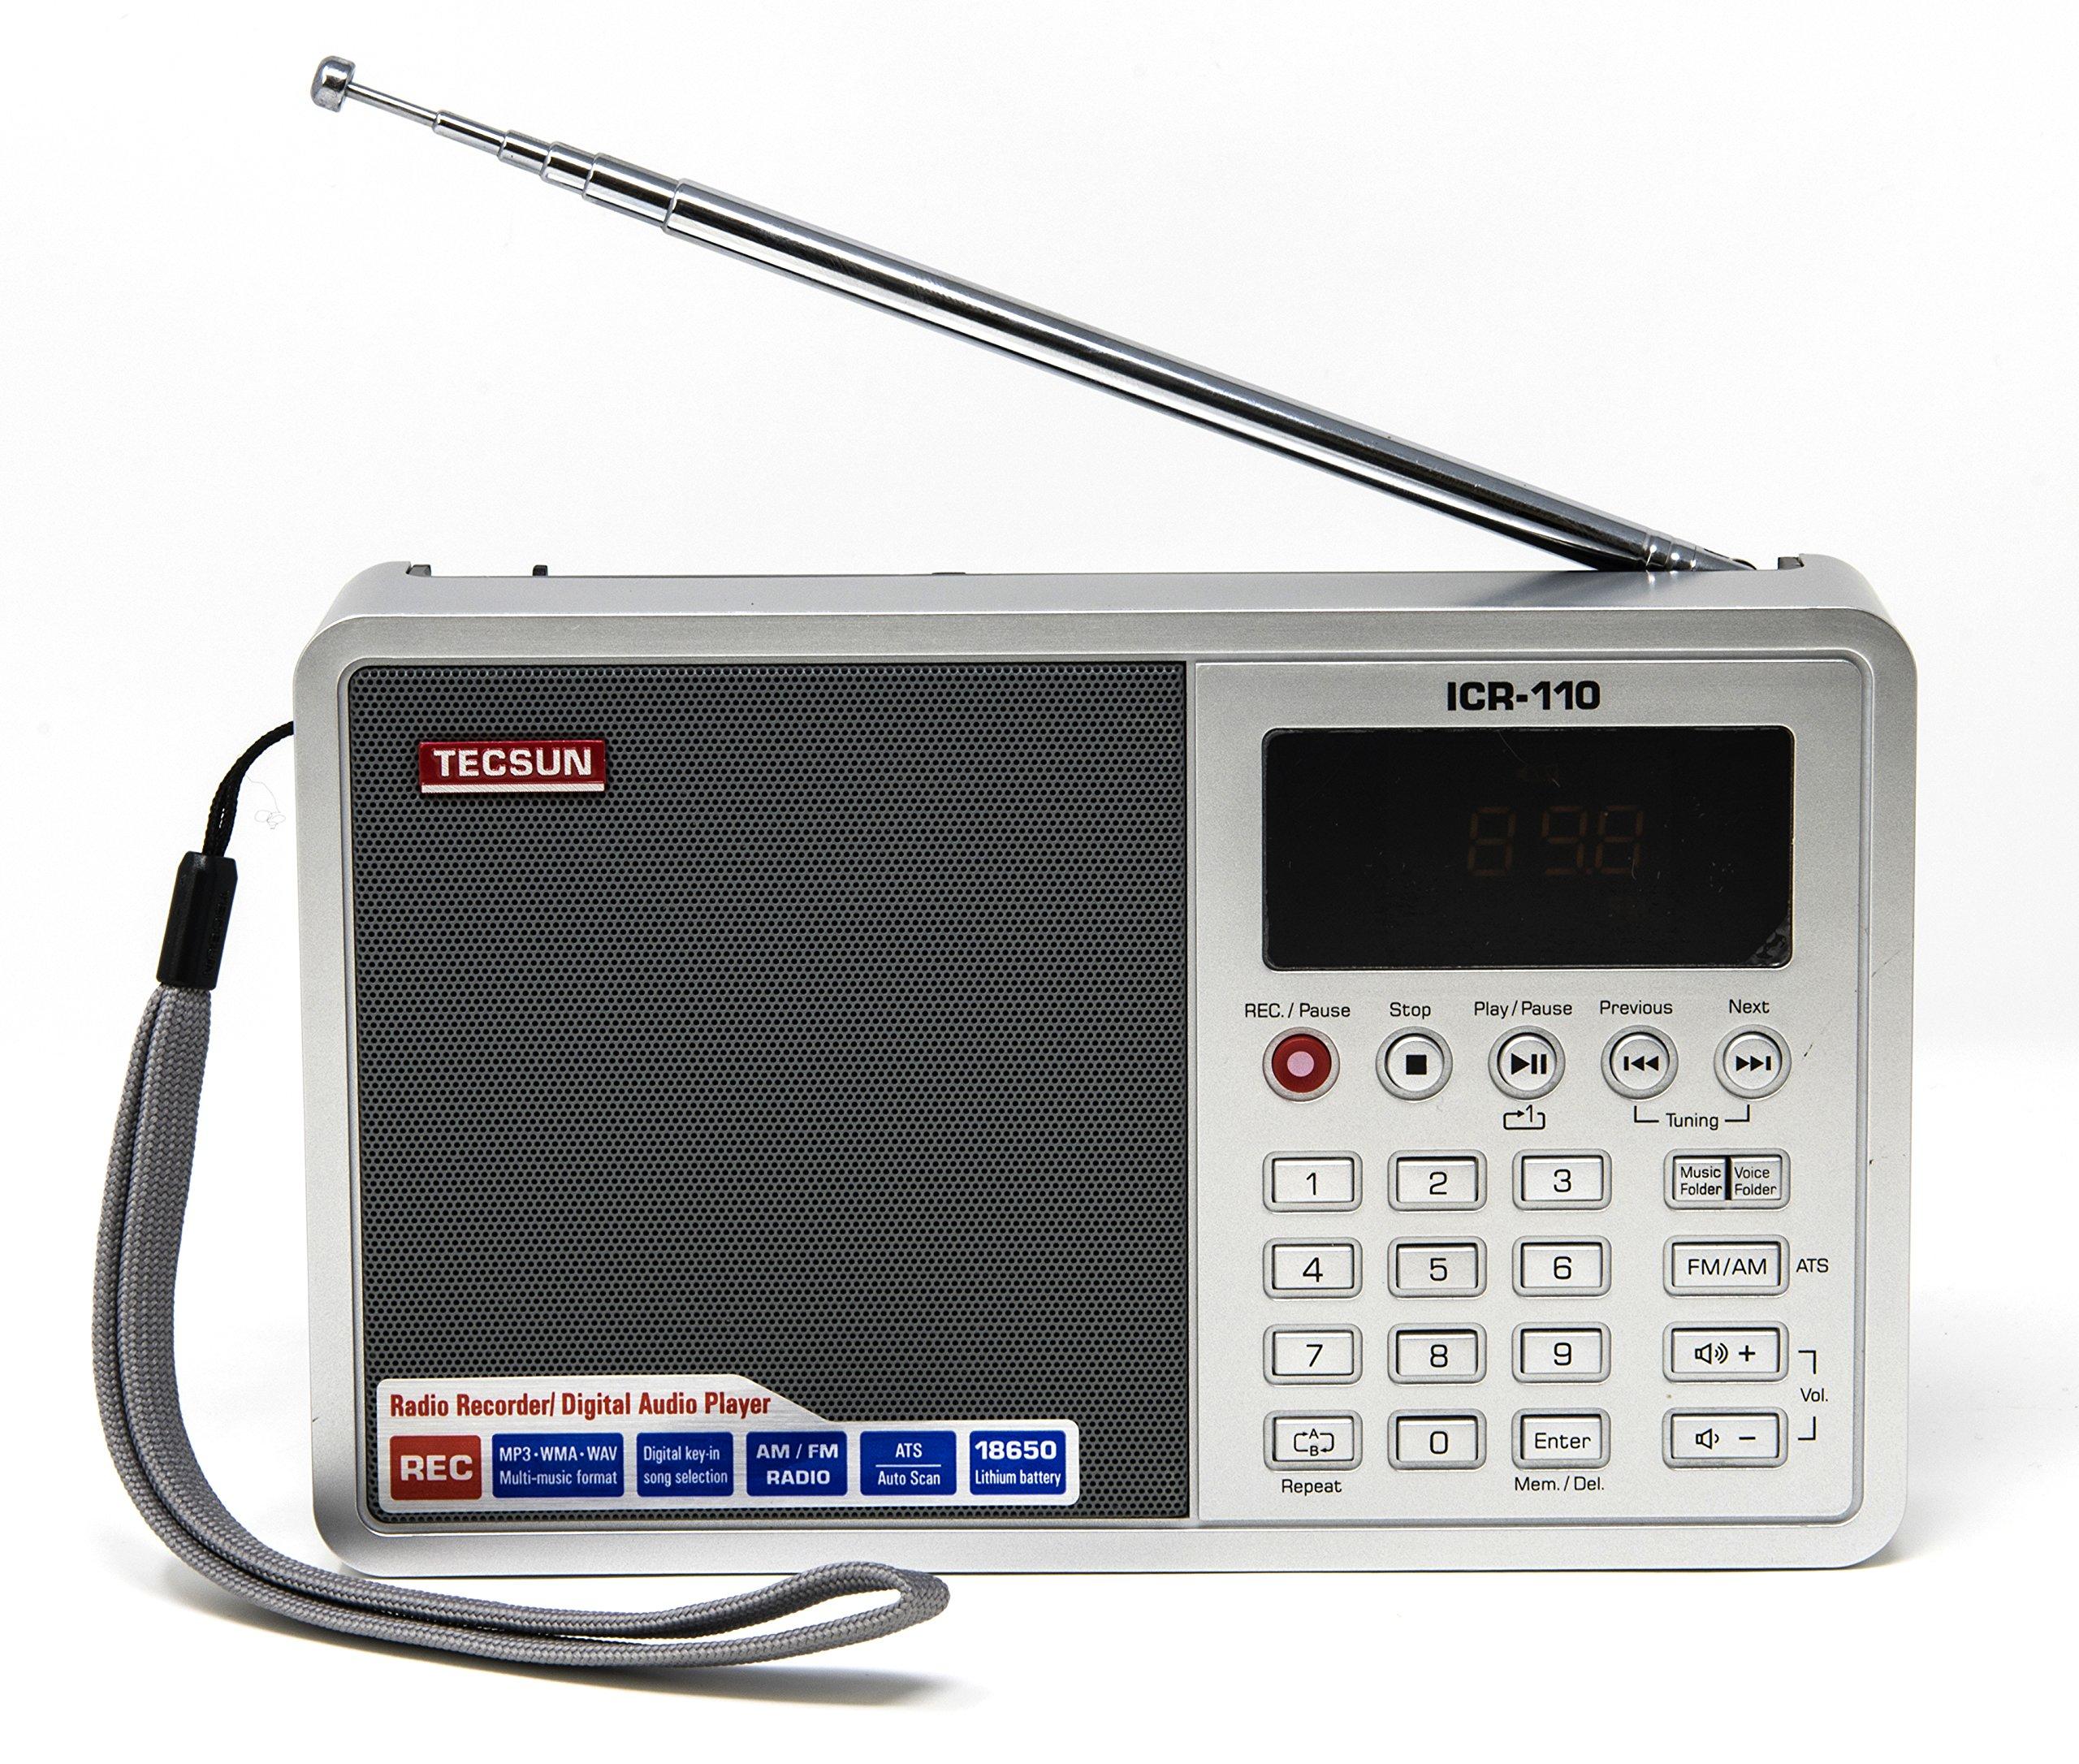 Tecsun ICR-110 4-in-1 Digital Portable AM/FM Radio + MP3 Player + Desktop / Laptop Computer USB Speaker + Digital Recorder, Color Silver (English Version)